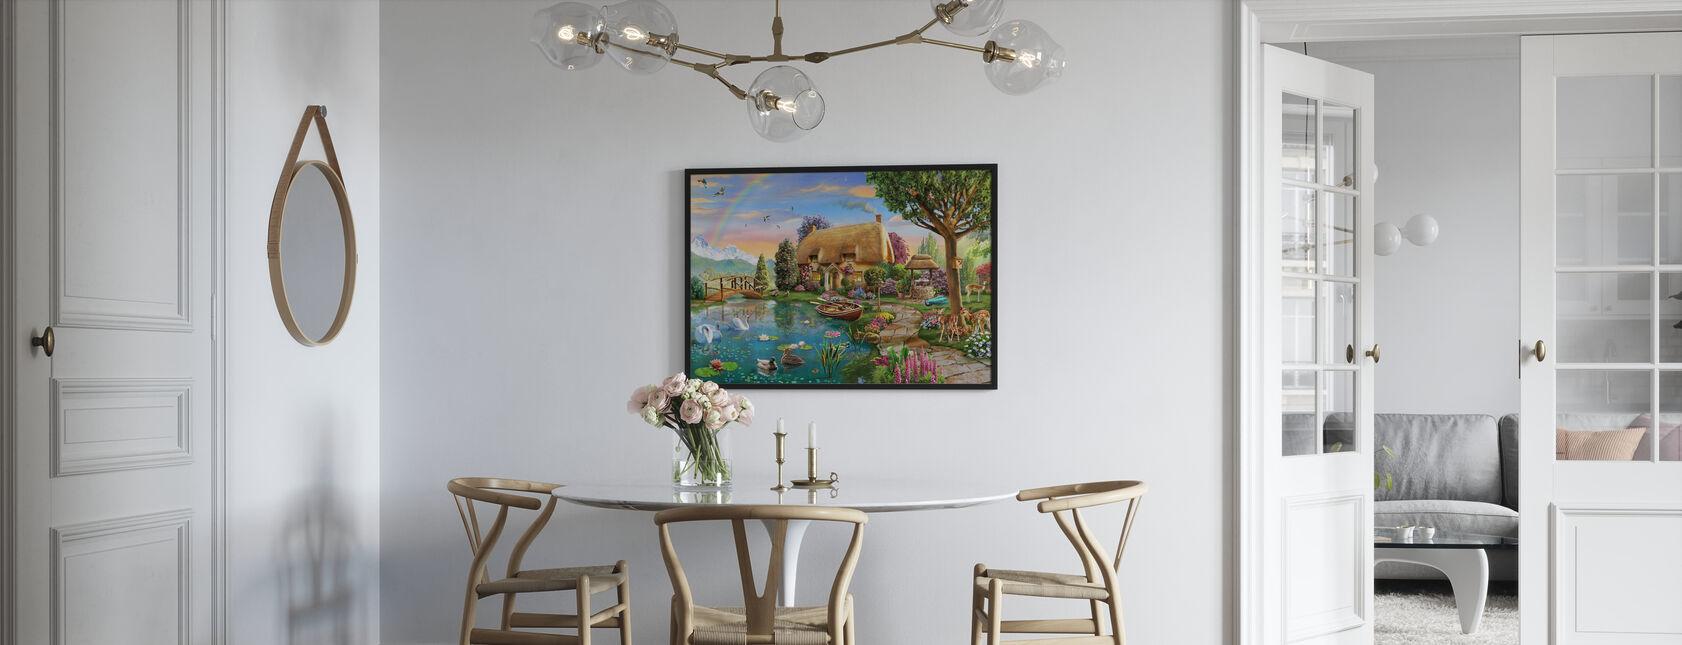 Lakeside Cottage - Poster - Kitchen